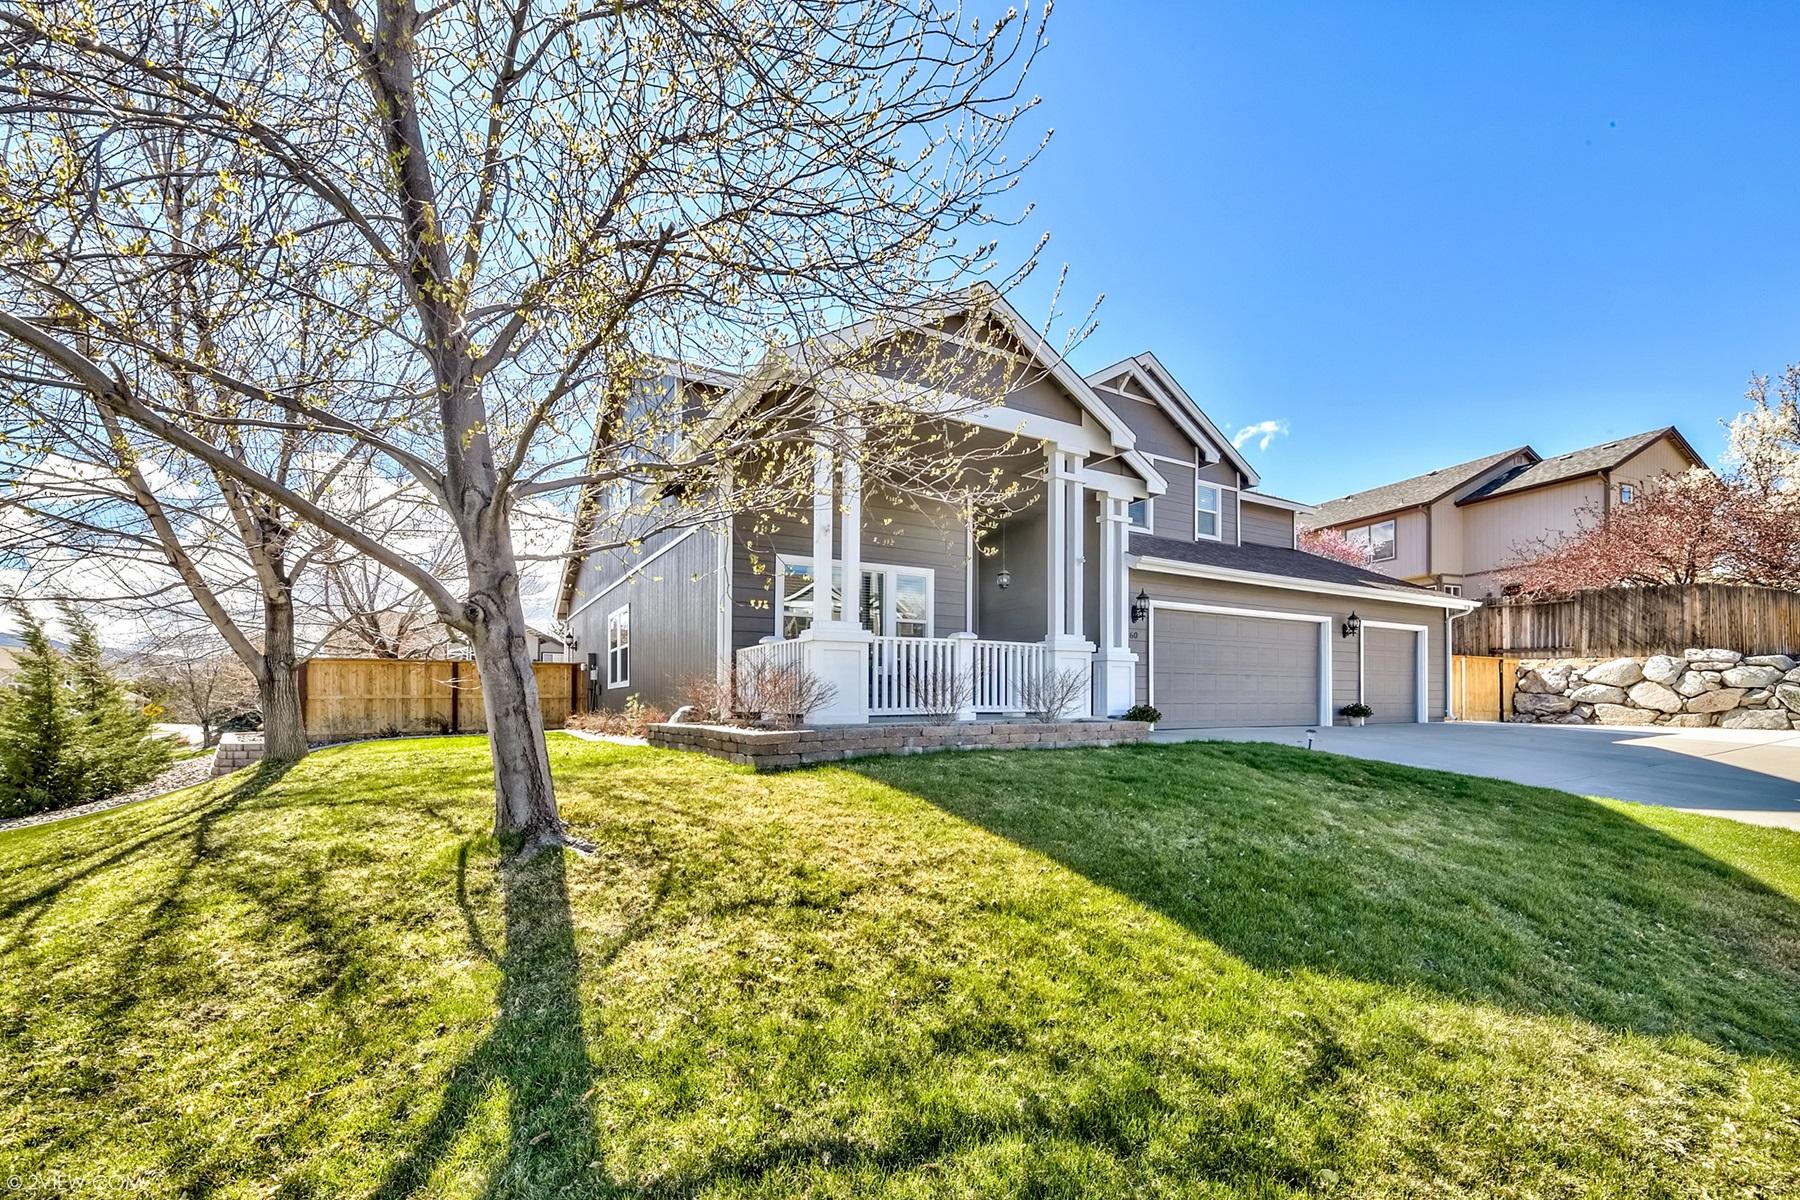 single family homes for Active at 60 Wagon Wheel, Reno, Nevada 60 Wagon Wheel Court Reno, Nevada 89511 United States